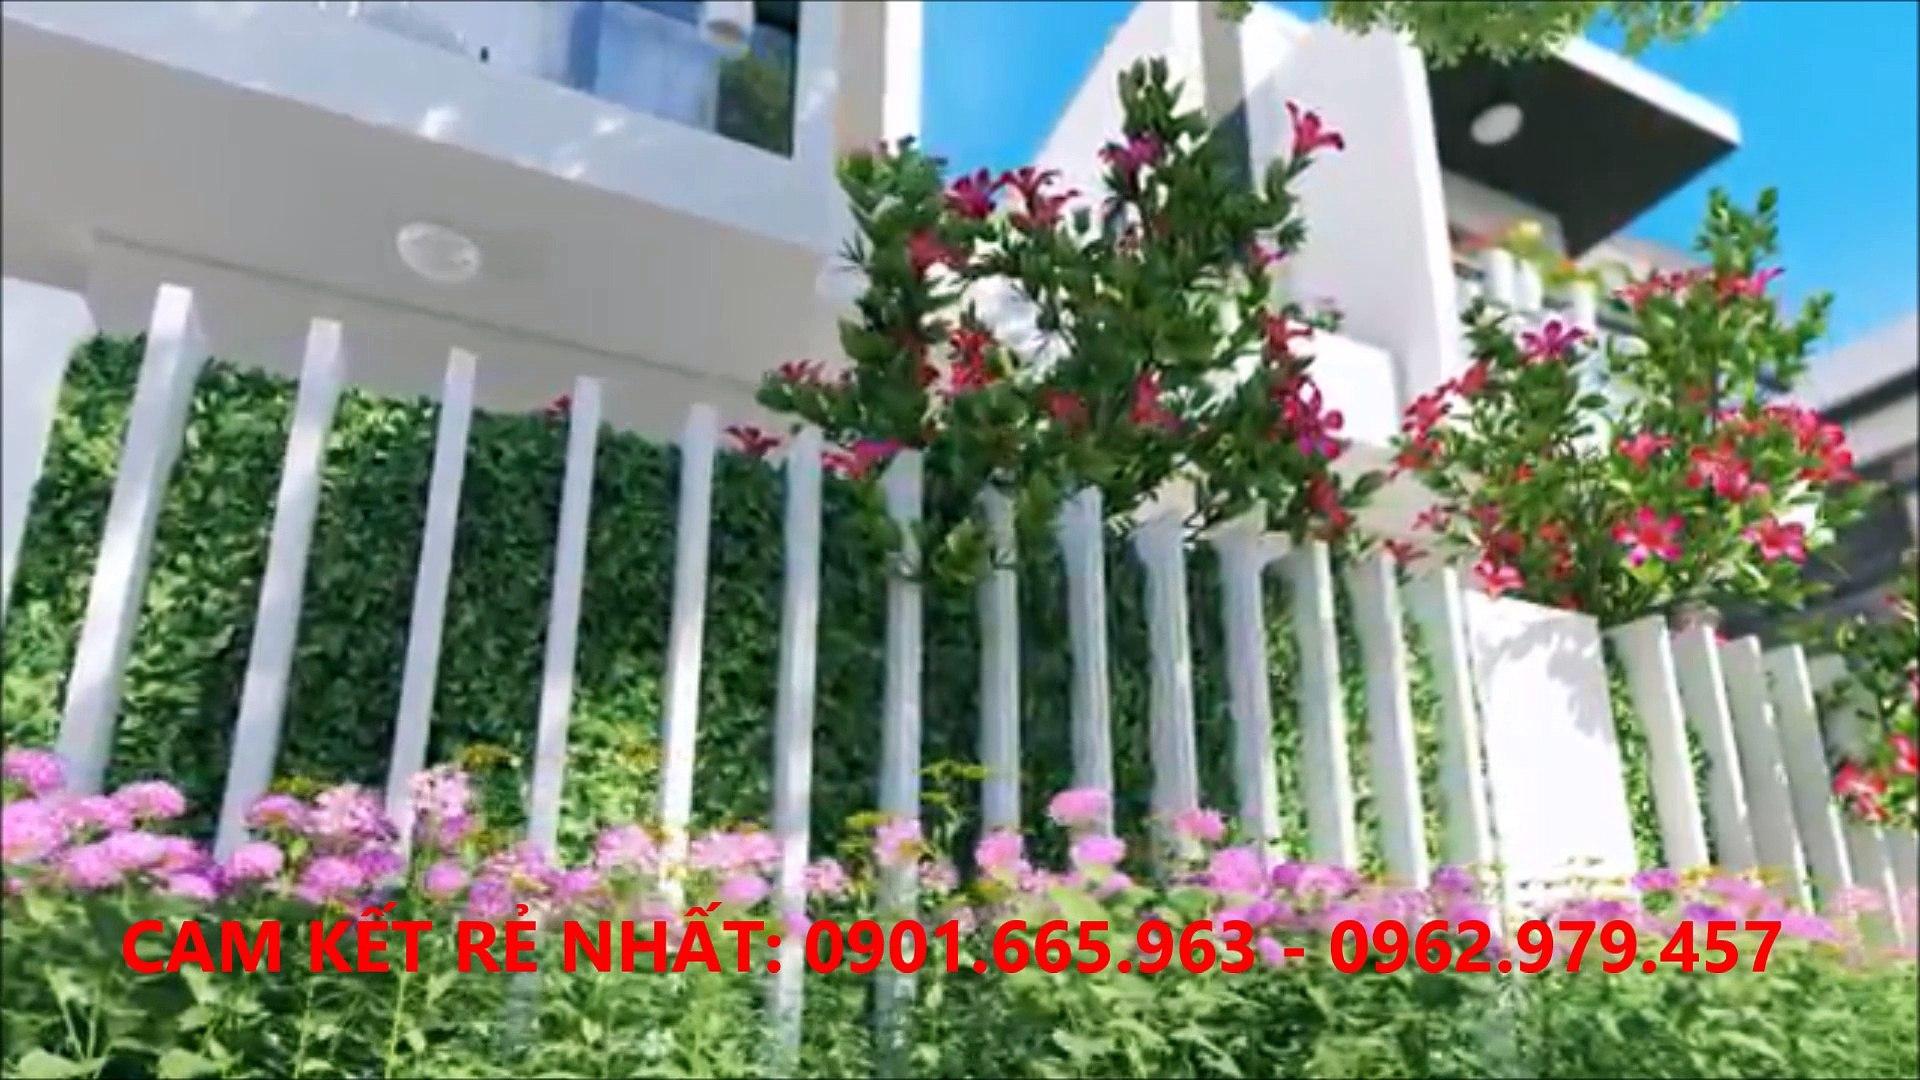 Bella Villa , Dự án bella villa Trần Anh cam kết rẻ nhất